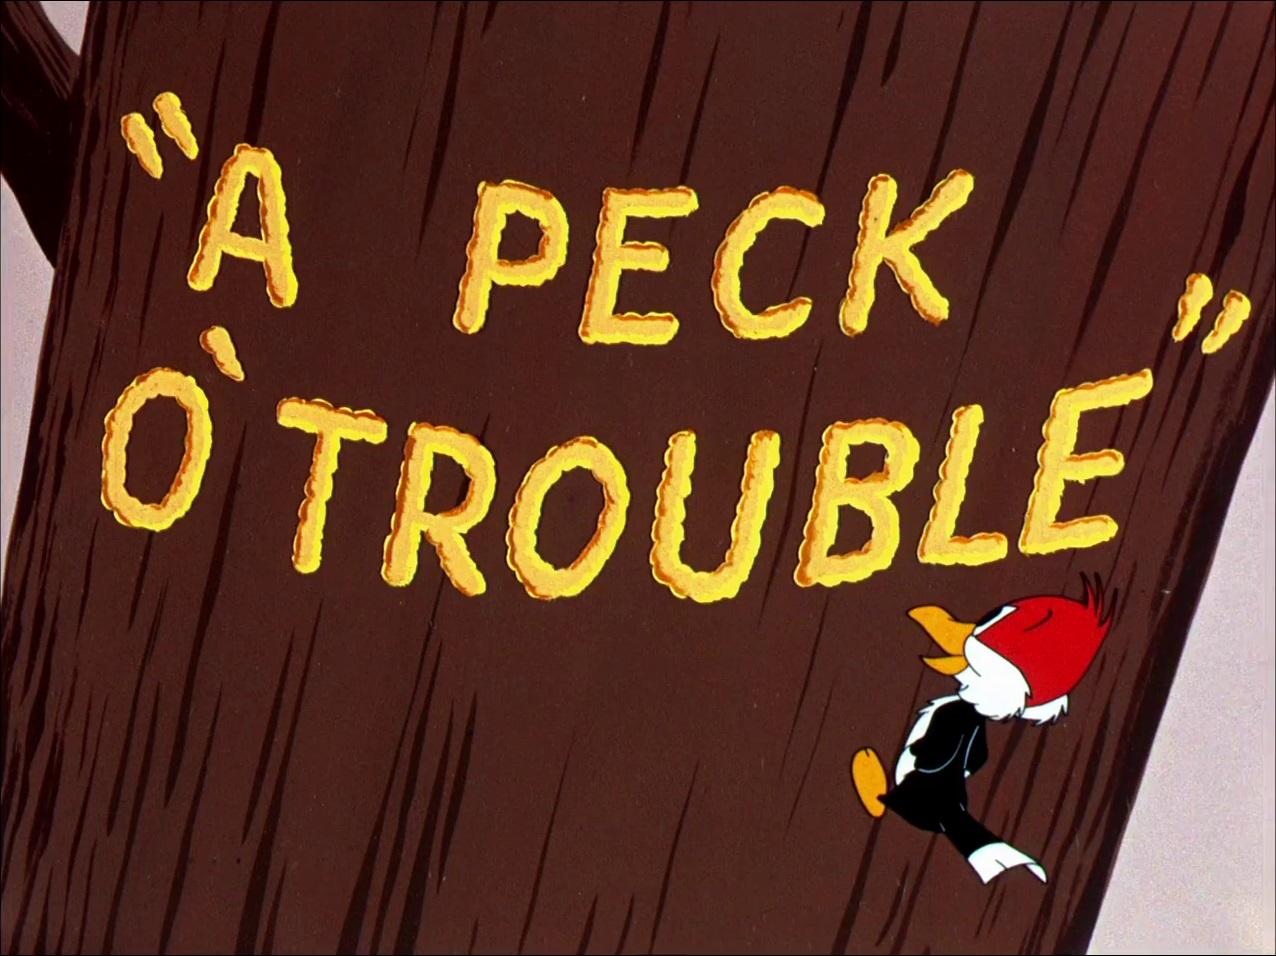 File:A Peck O' Trouble.jpg